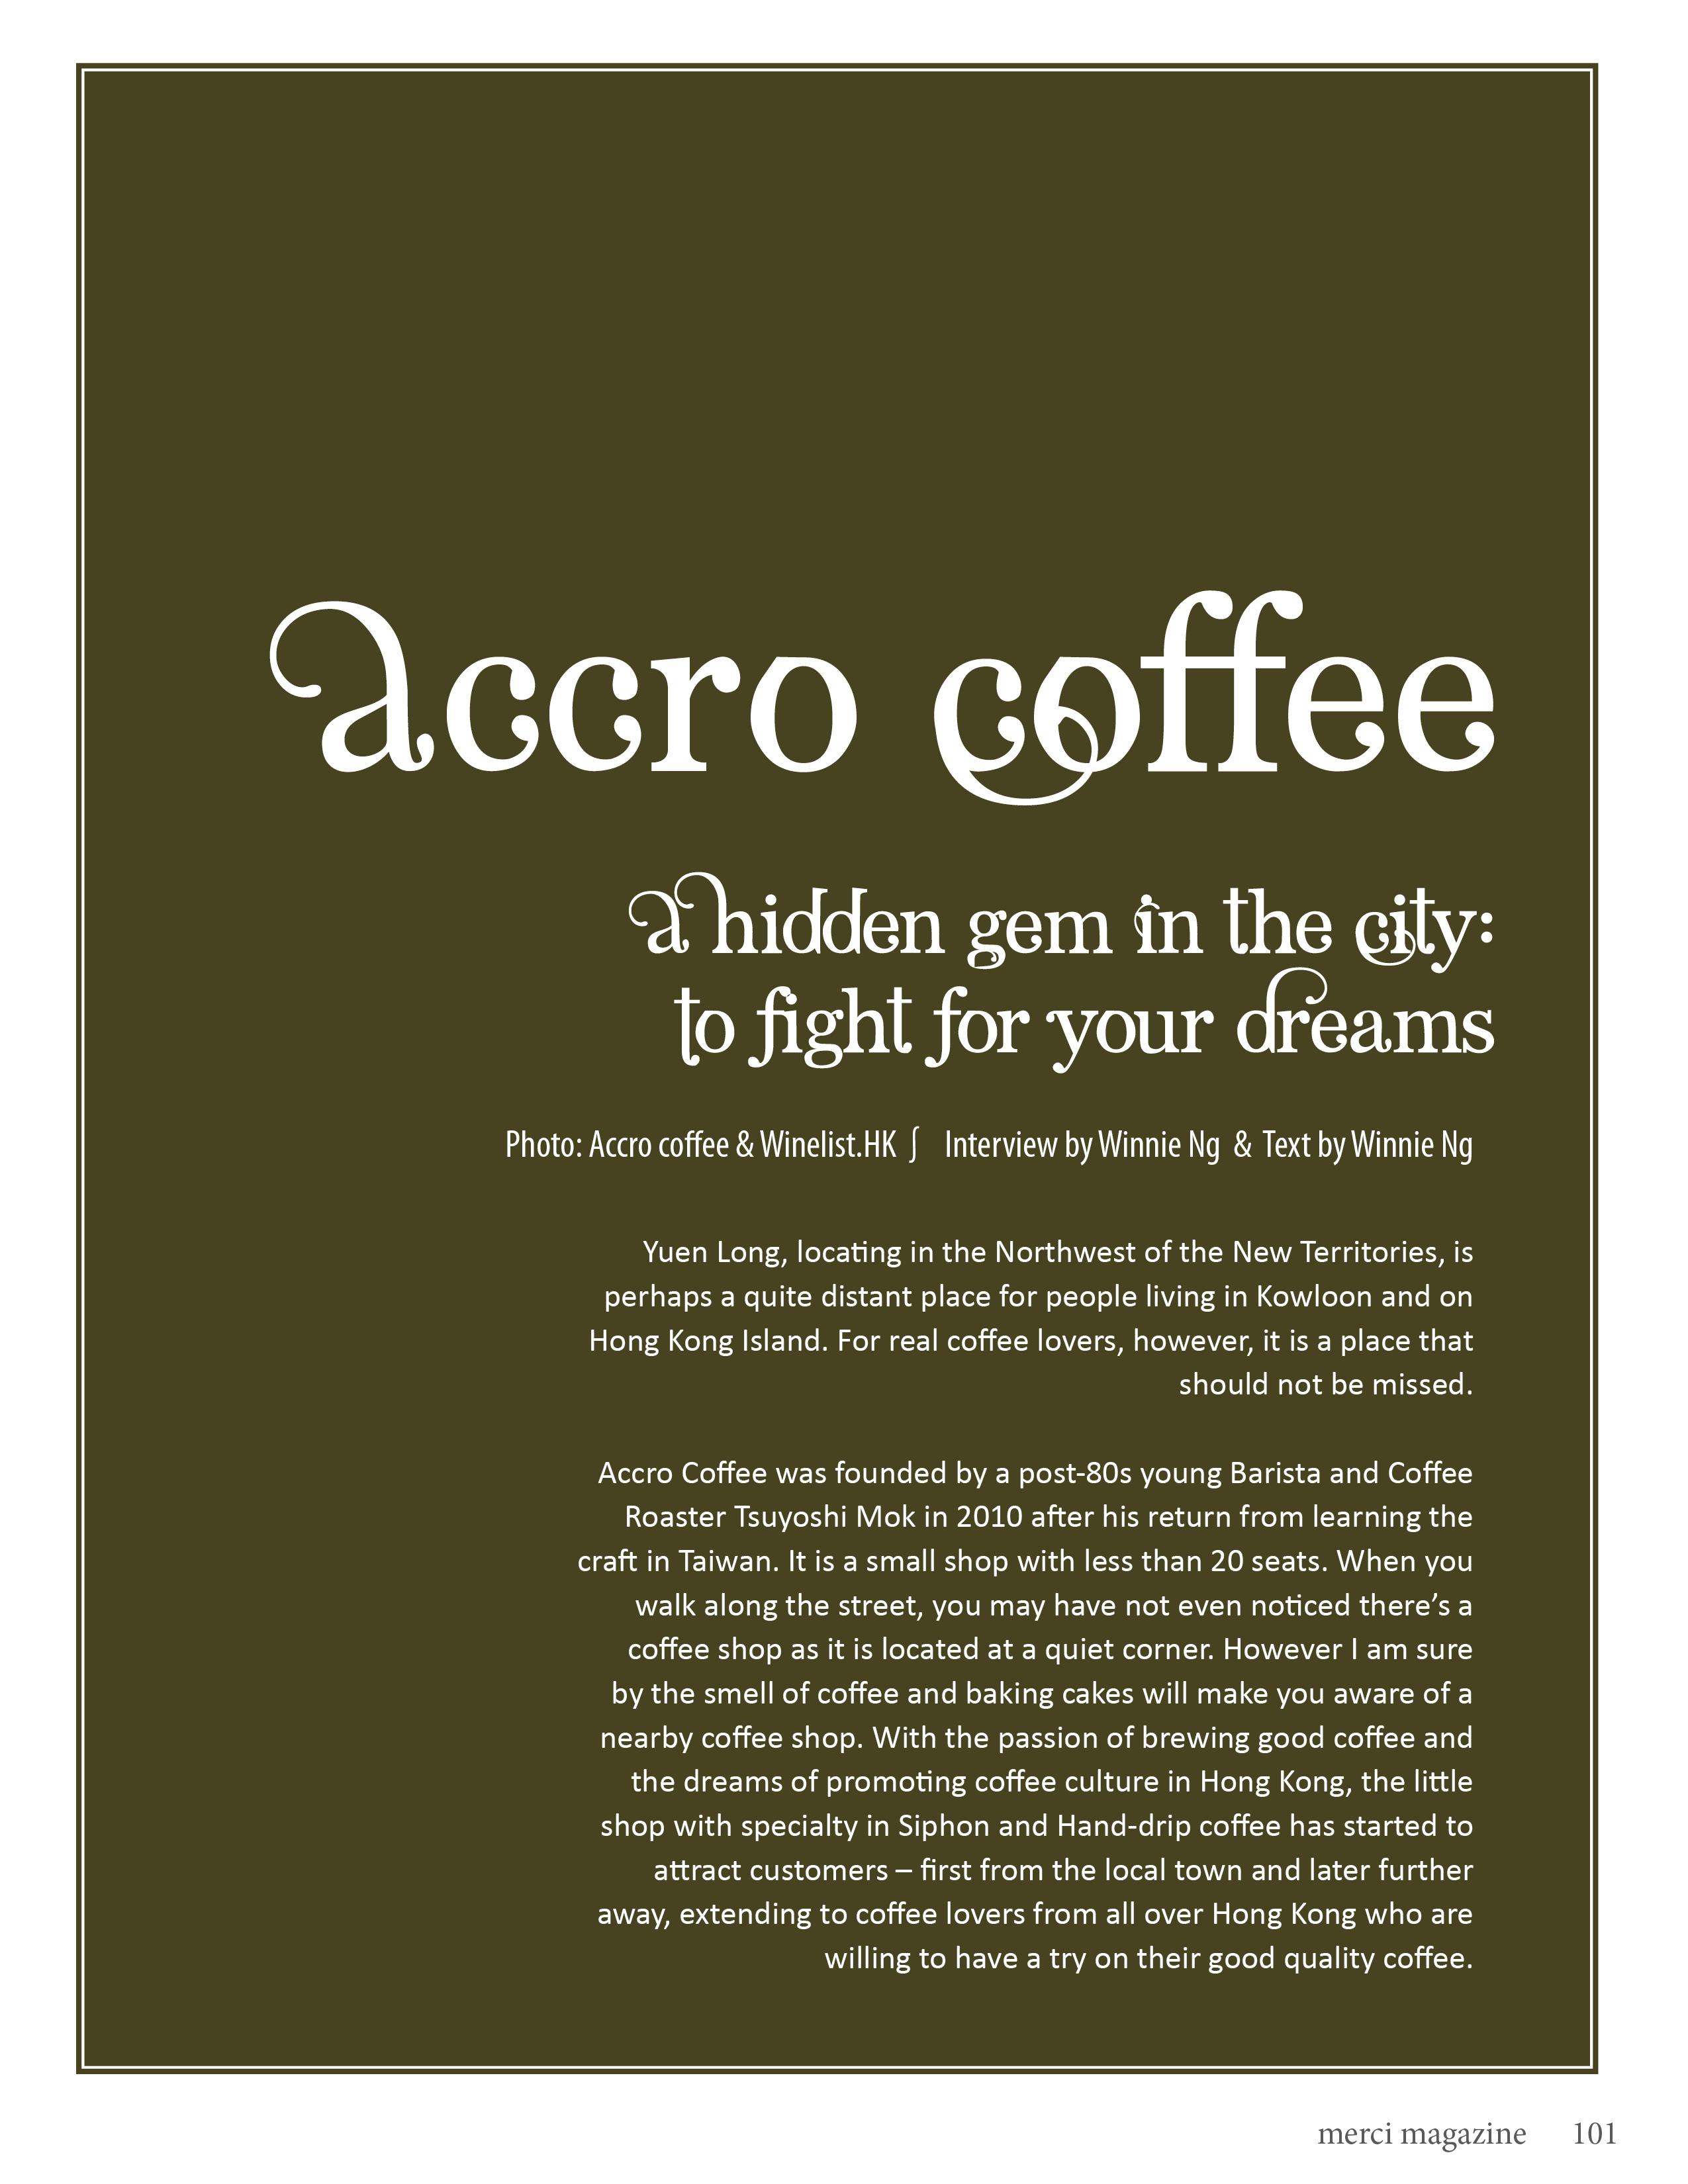 merci - Accro Coffee 20142